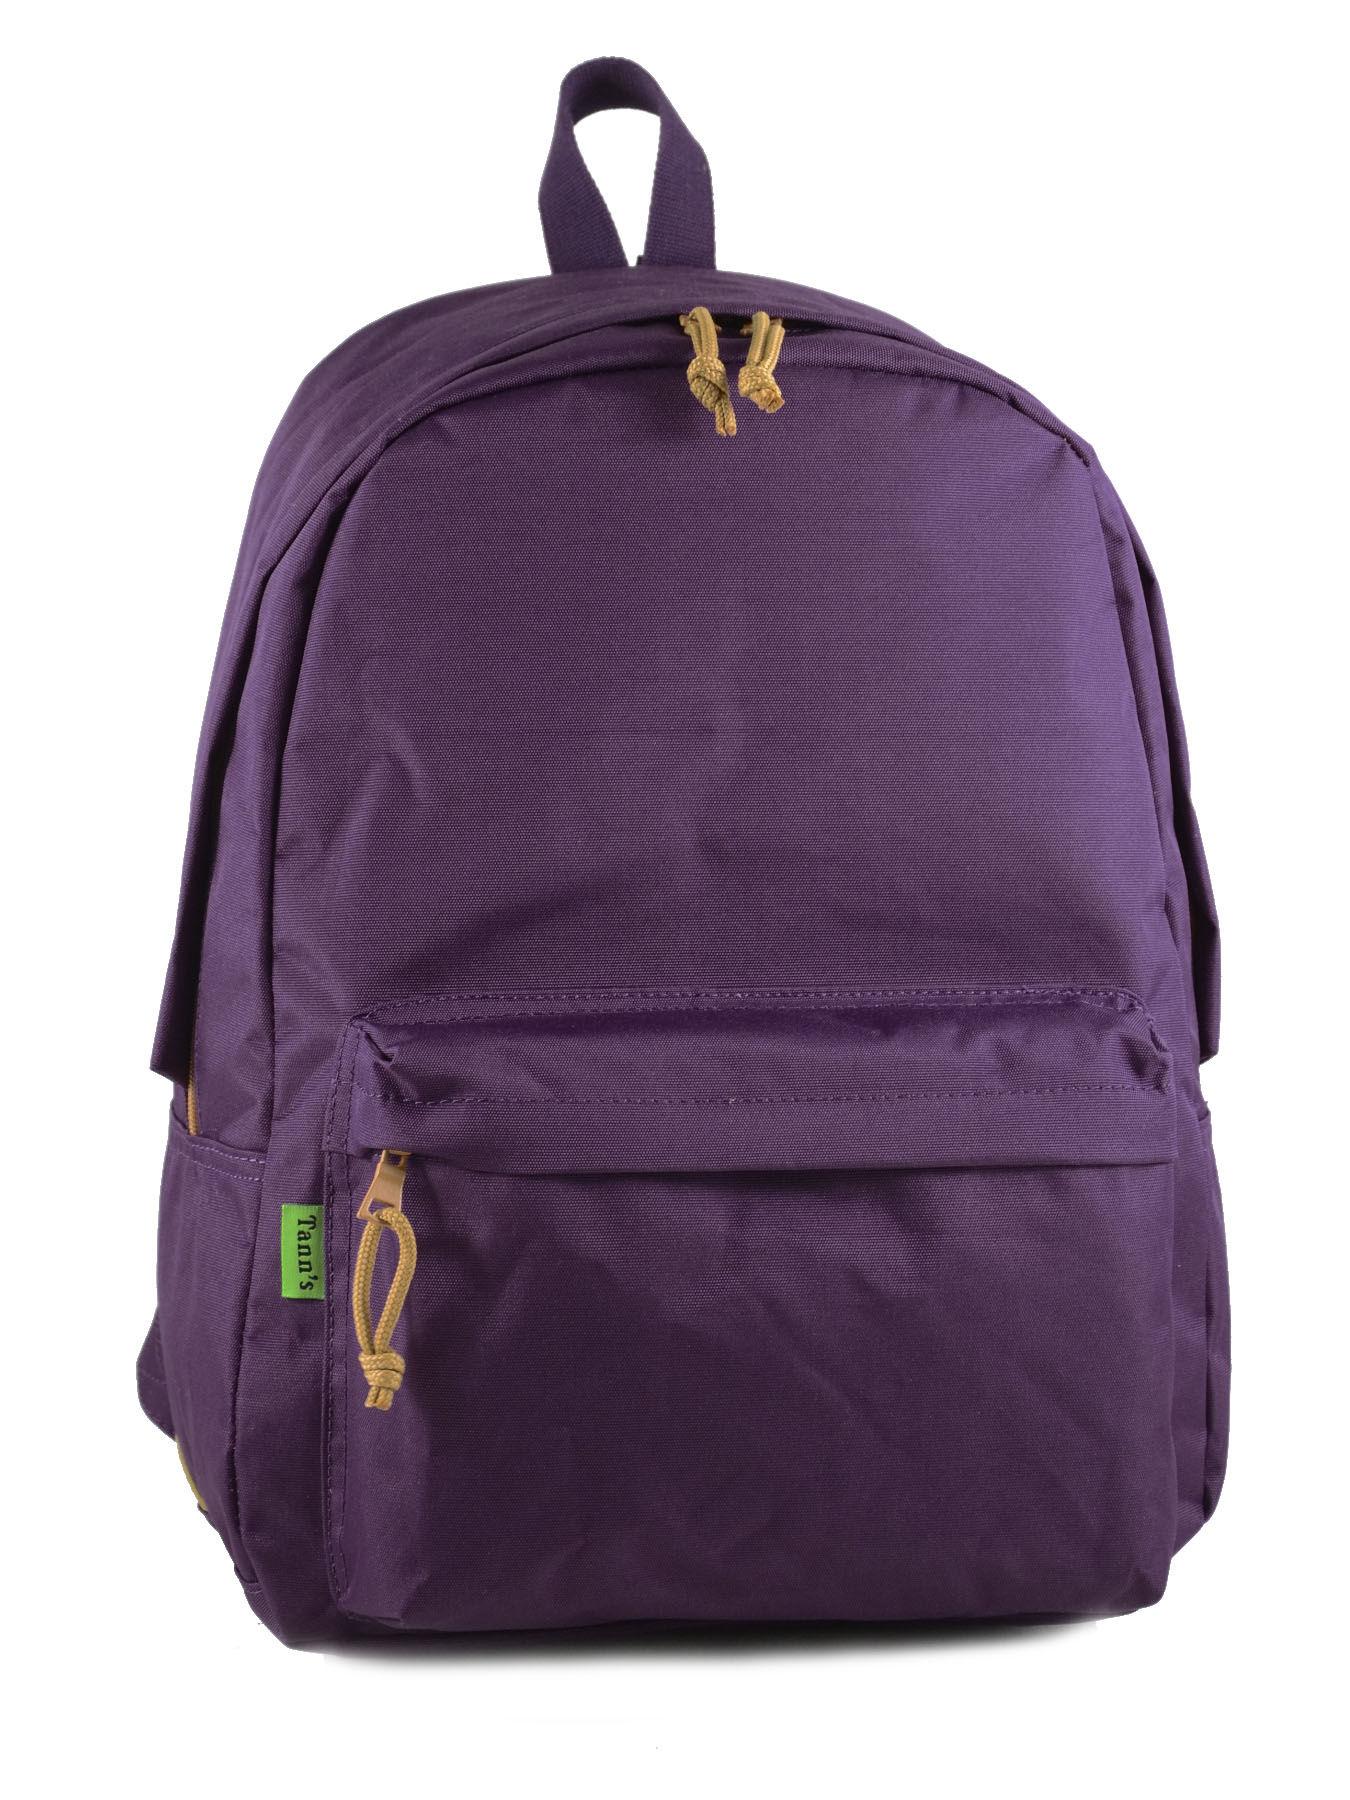 sac dos tann 39 s violet kid classic 13sadm. Black Bedroom Furniture Sets. Home Design Ideas